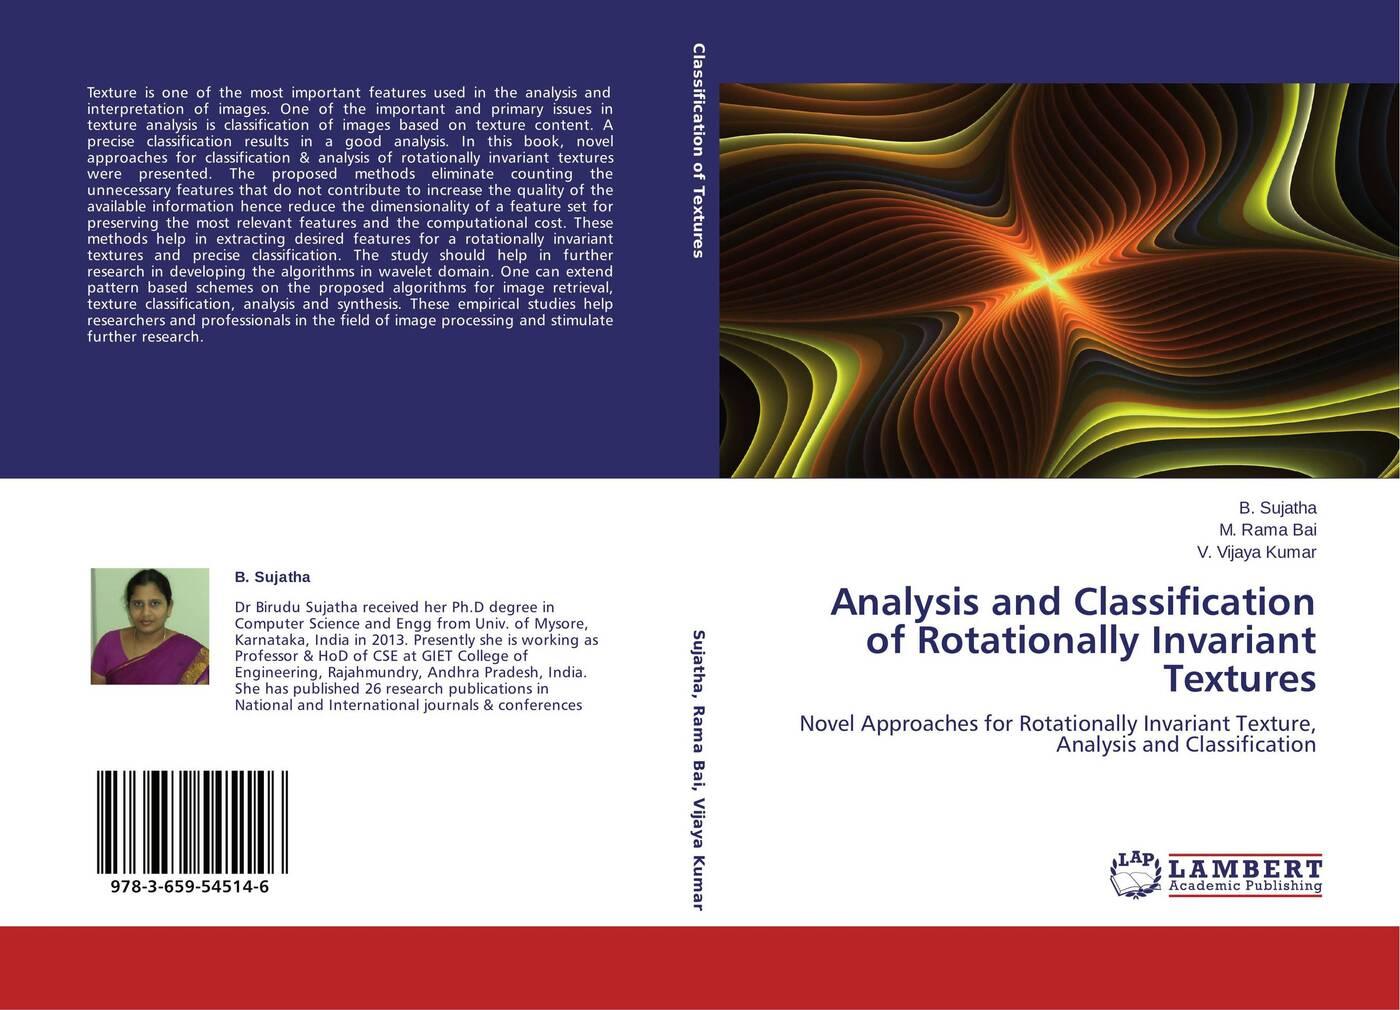 B. Sujatha,M. Rama Bai and V. Vijaya Kumar Analysis and Classification of Rotationally Invariant Textures цена